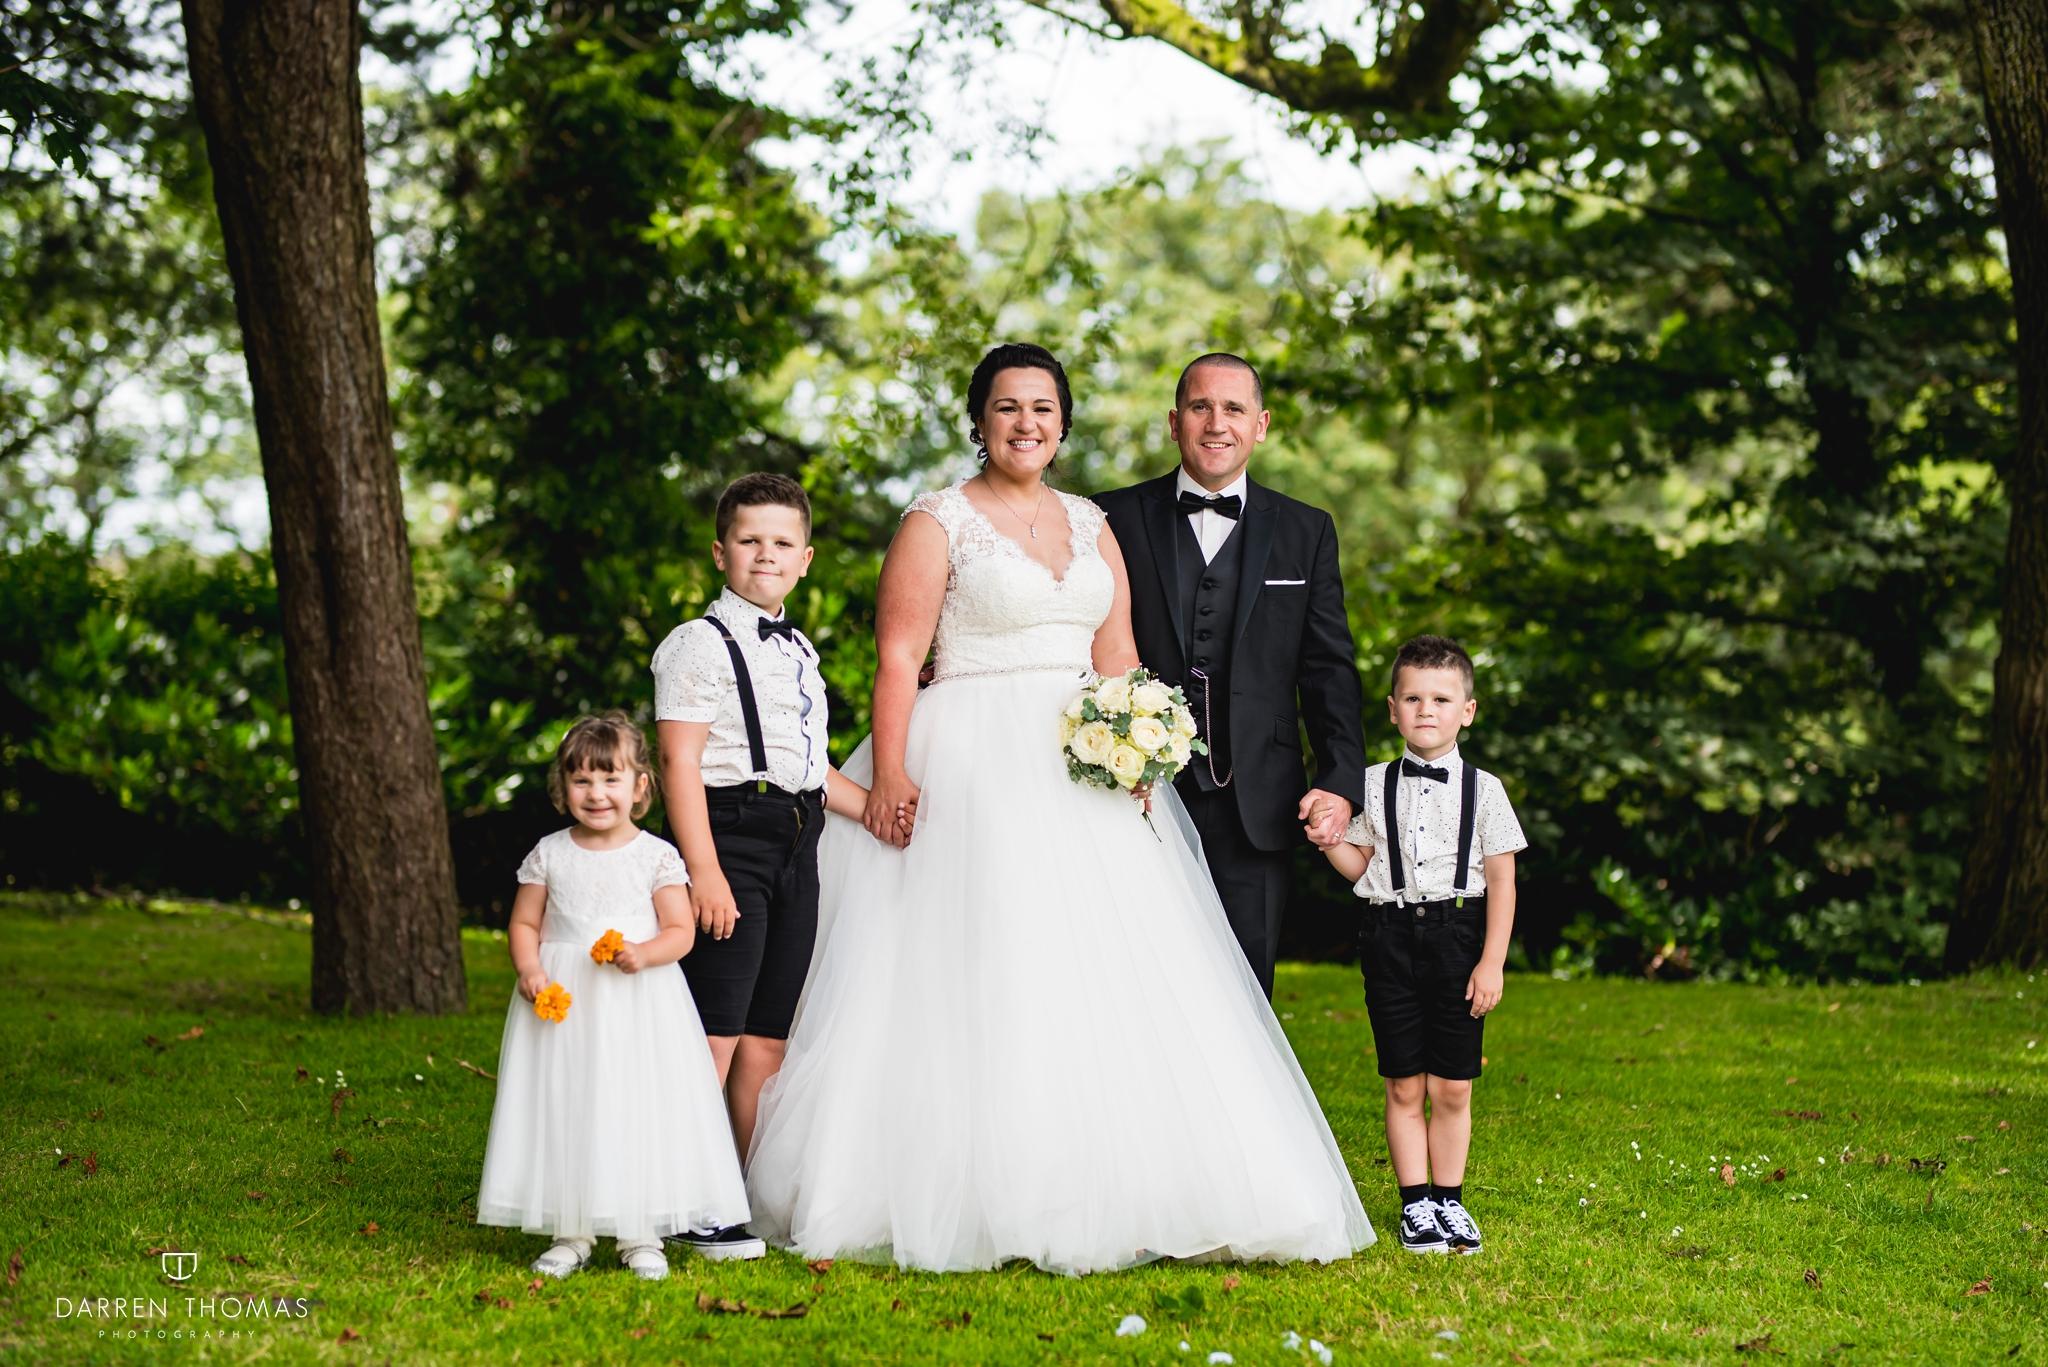 Llechwen-hall-wedding-photography12.jpg